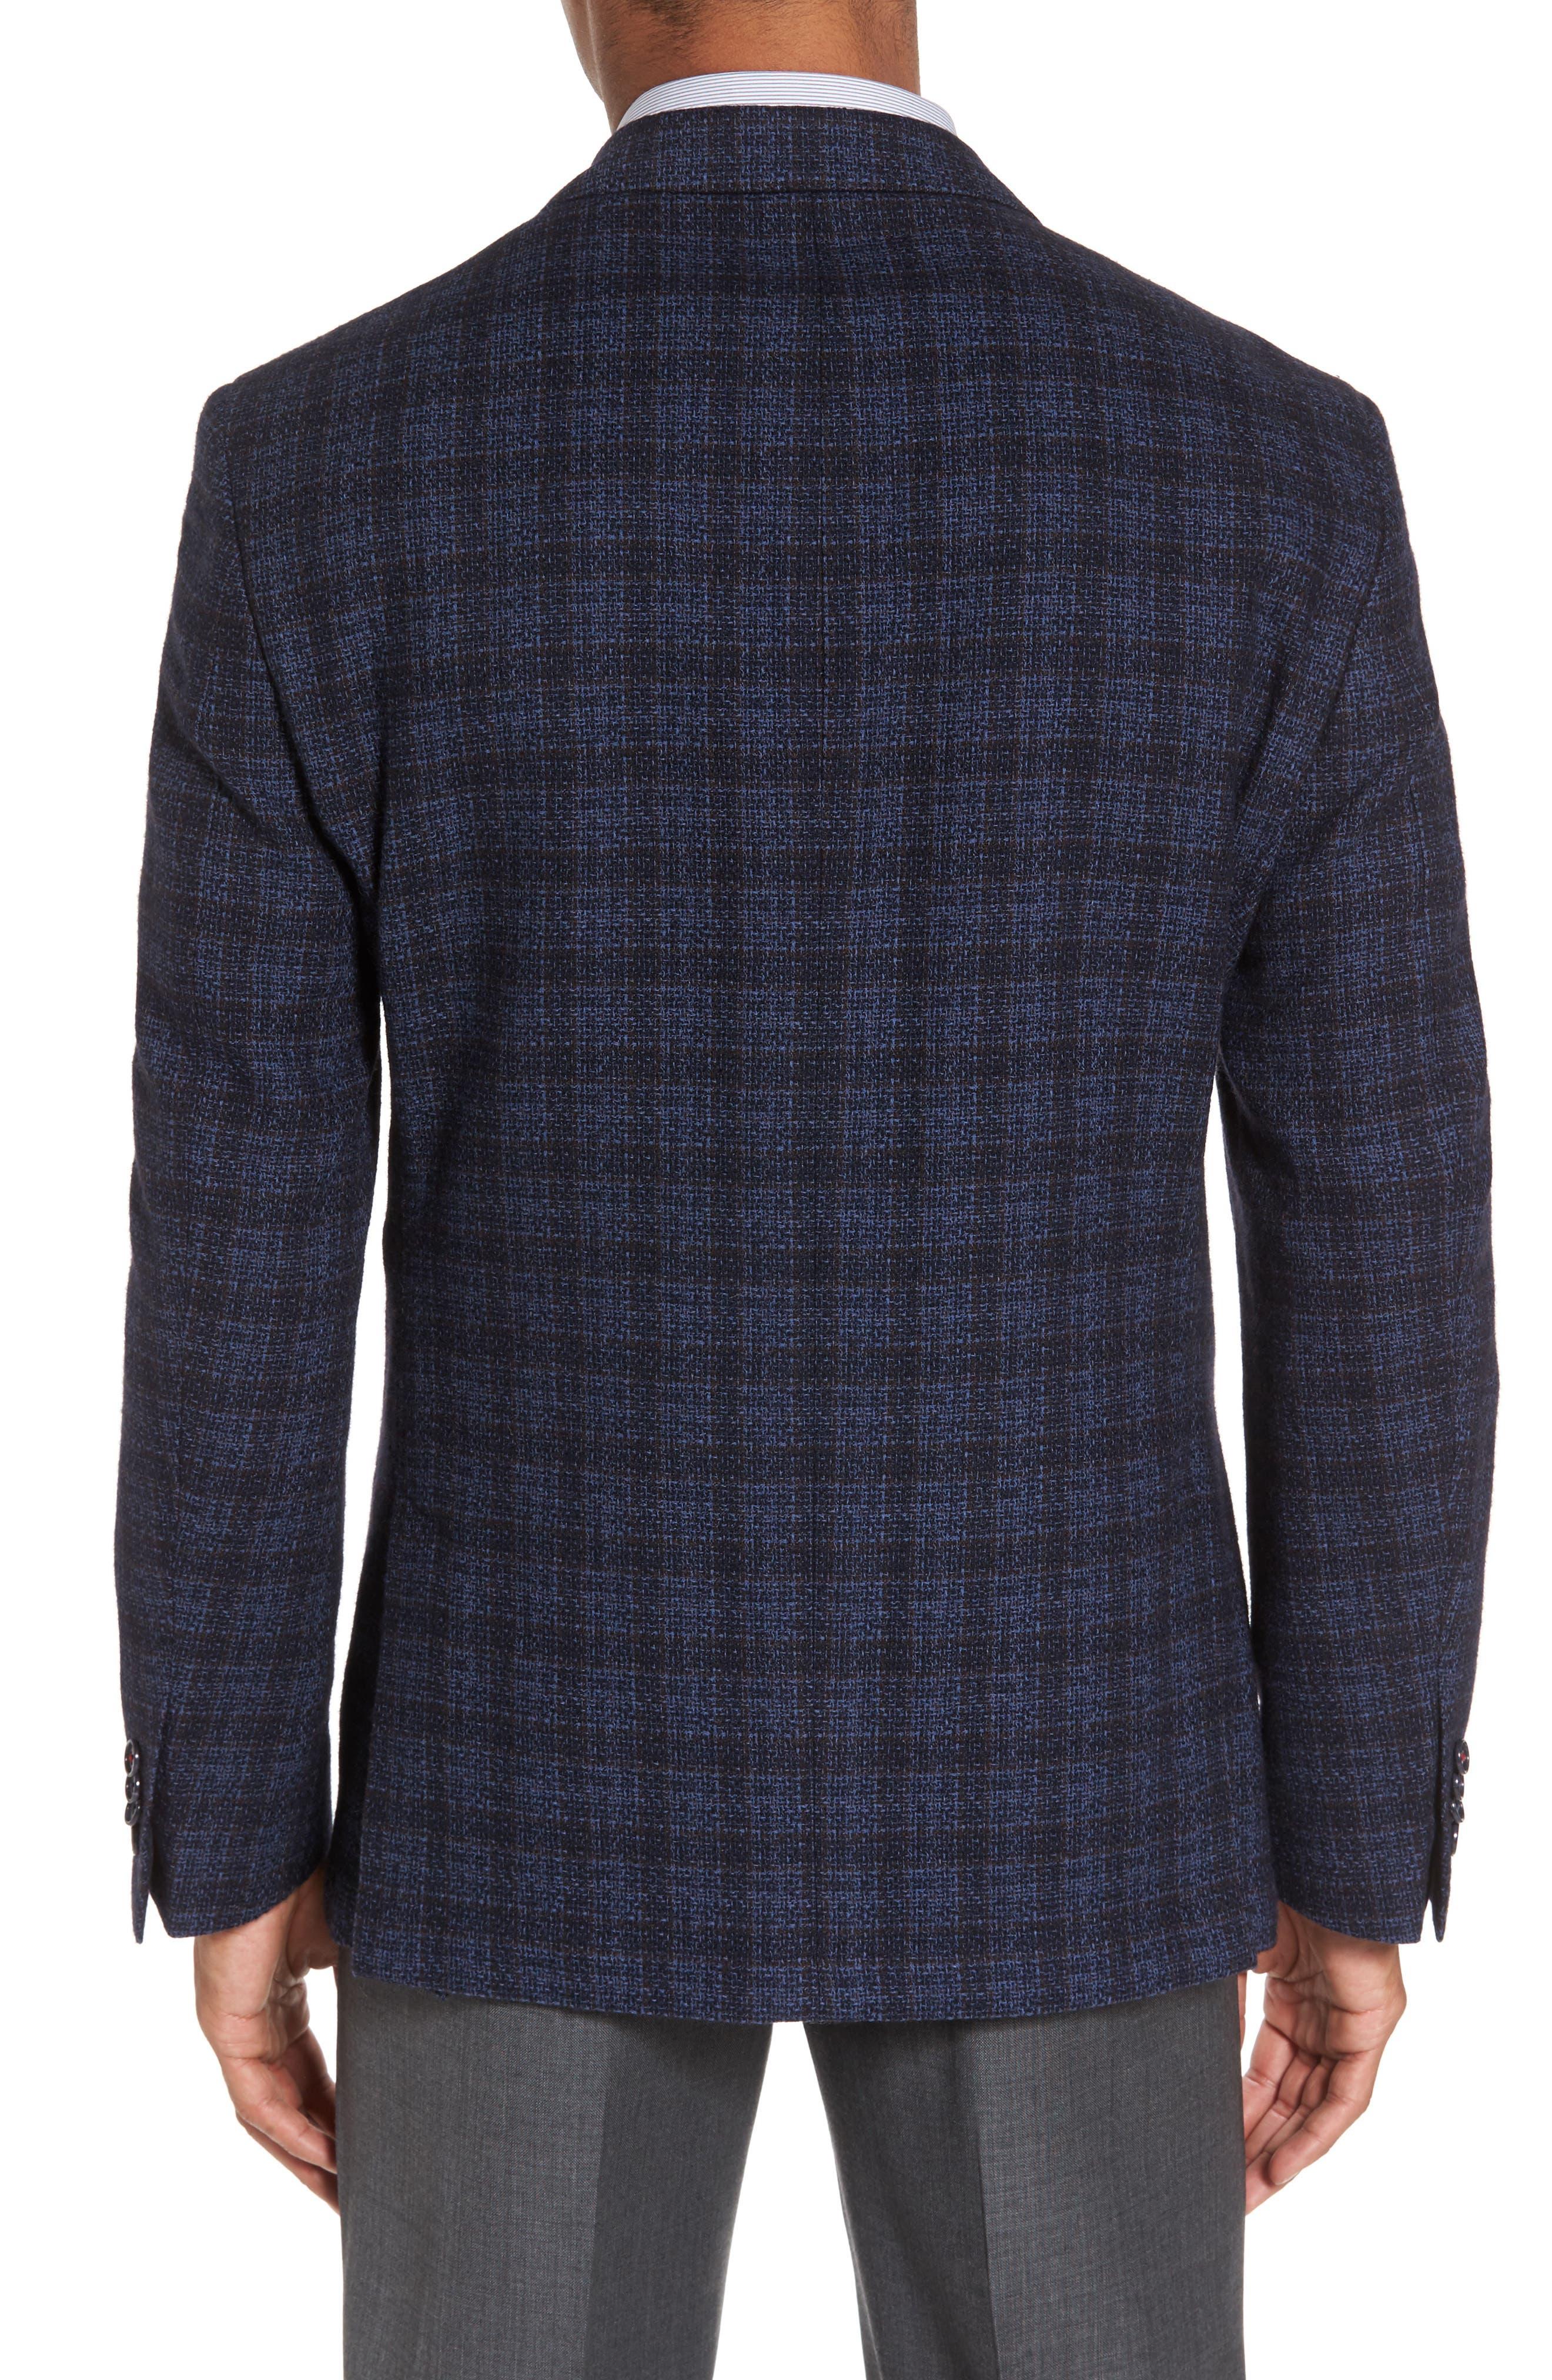 Alternate Image 2  - JKT New York Trim Fit Plaid Cotton Blend Sport Coat